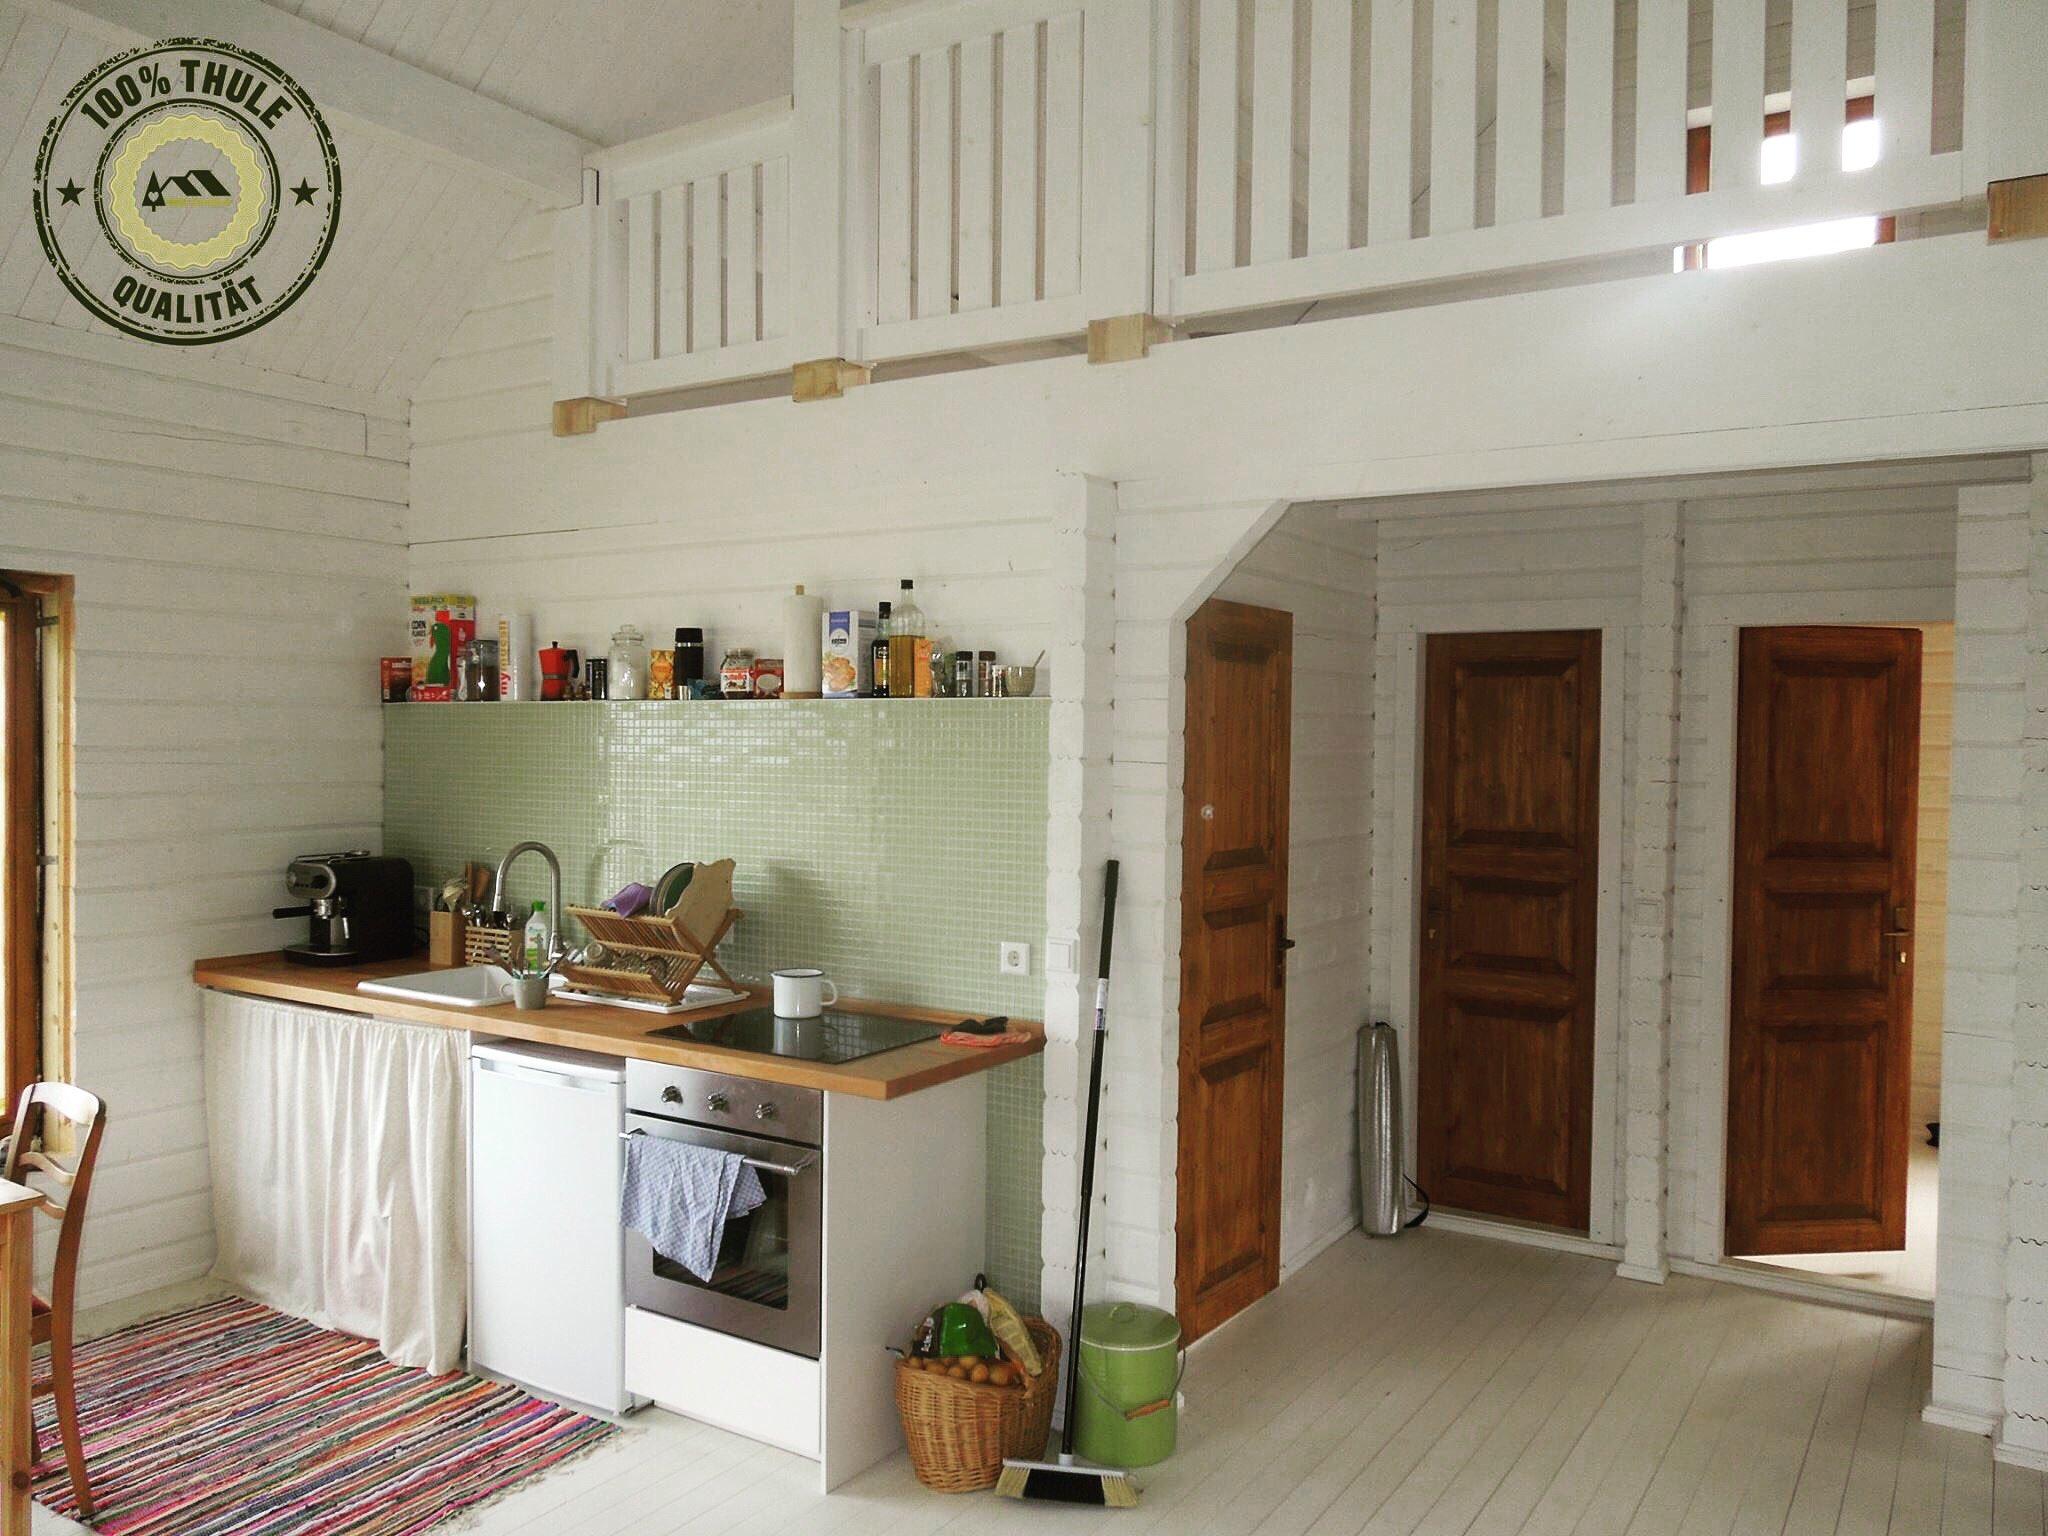 Thule Blockhaus Gmbh On Twitter Haustyp Nordland Mit Erhohtem